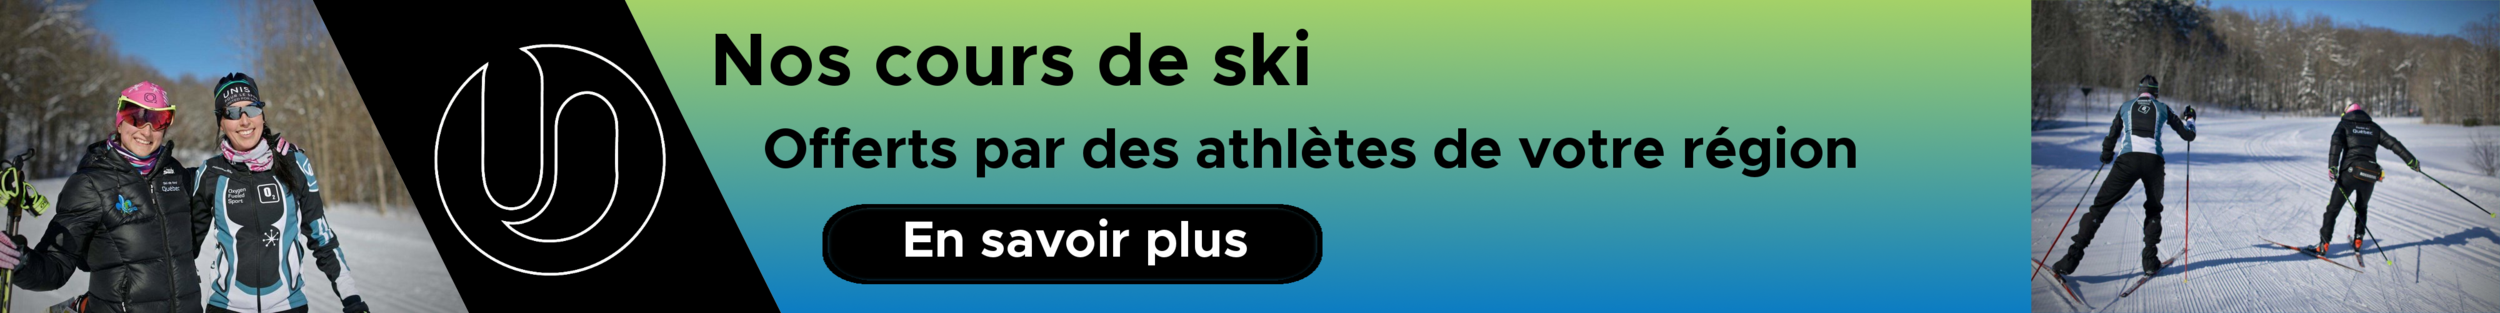 Banner_Ski_lessonsx8-m02.png